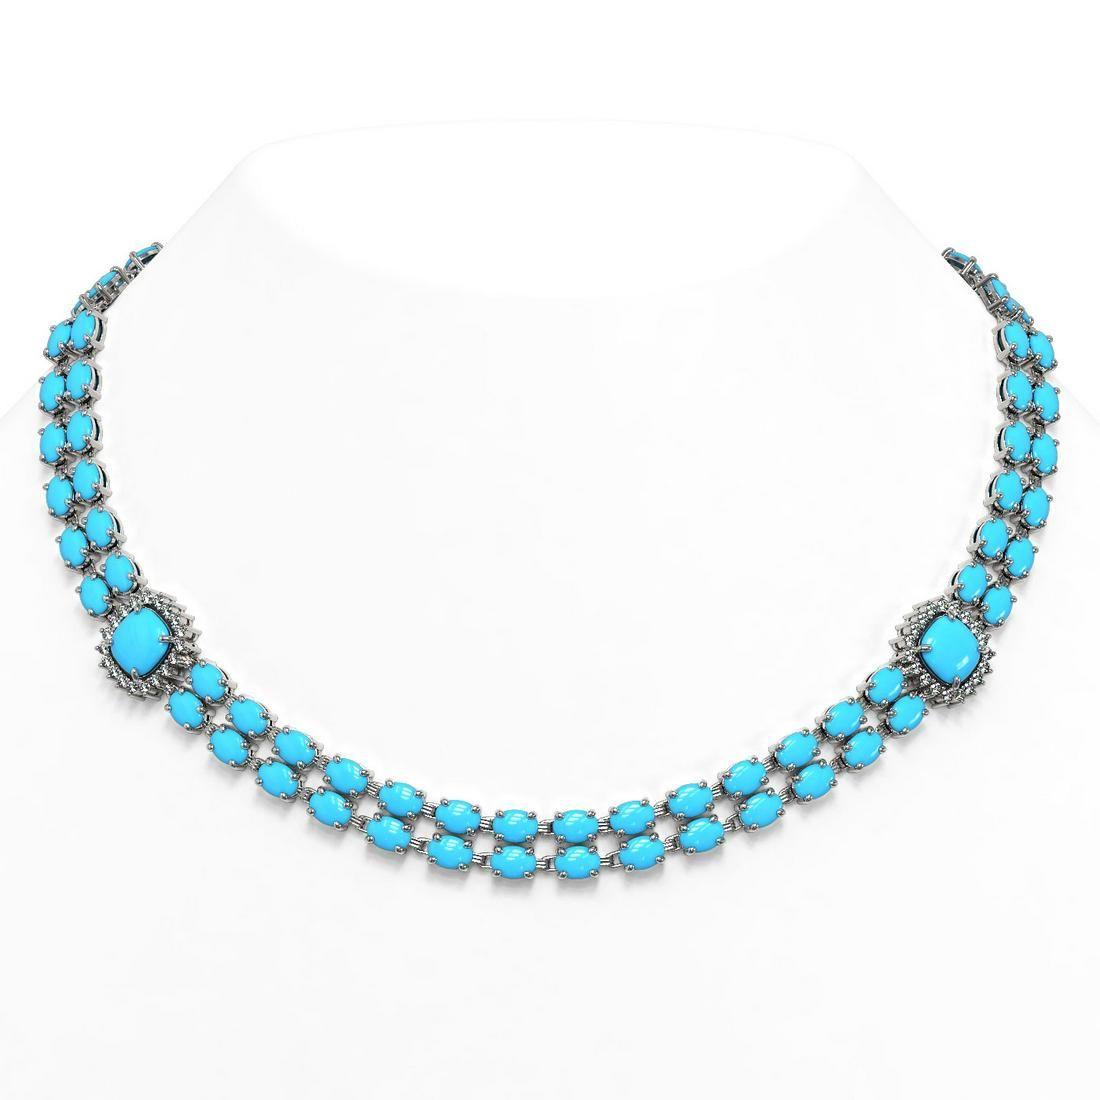 53.53 ctw Turquoise & Diamond Necklace 14K White Gold -